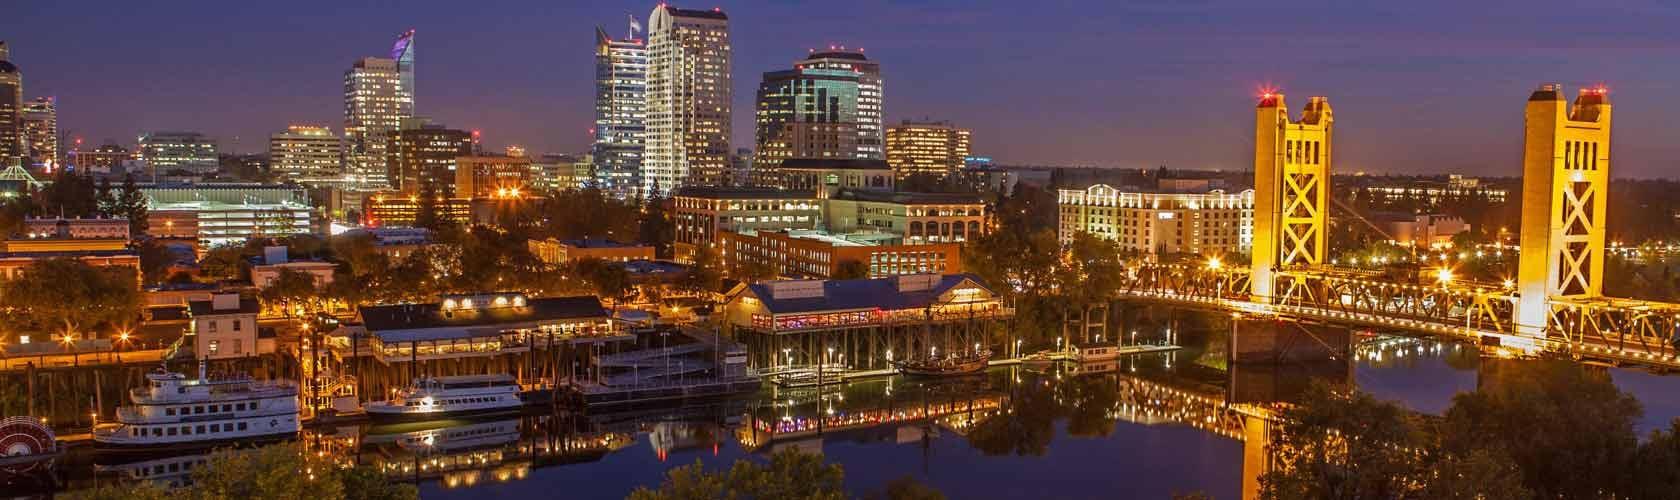 Sacramento_Skyline_at_Night